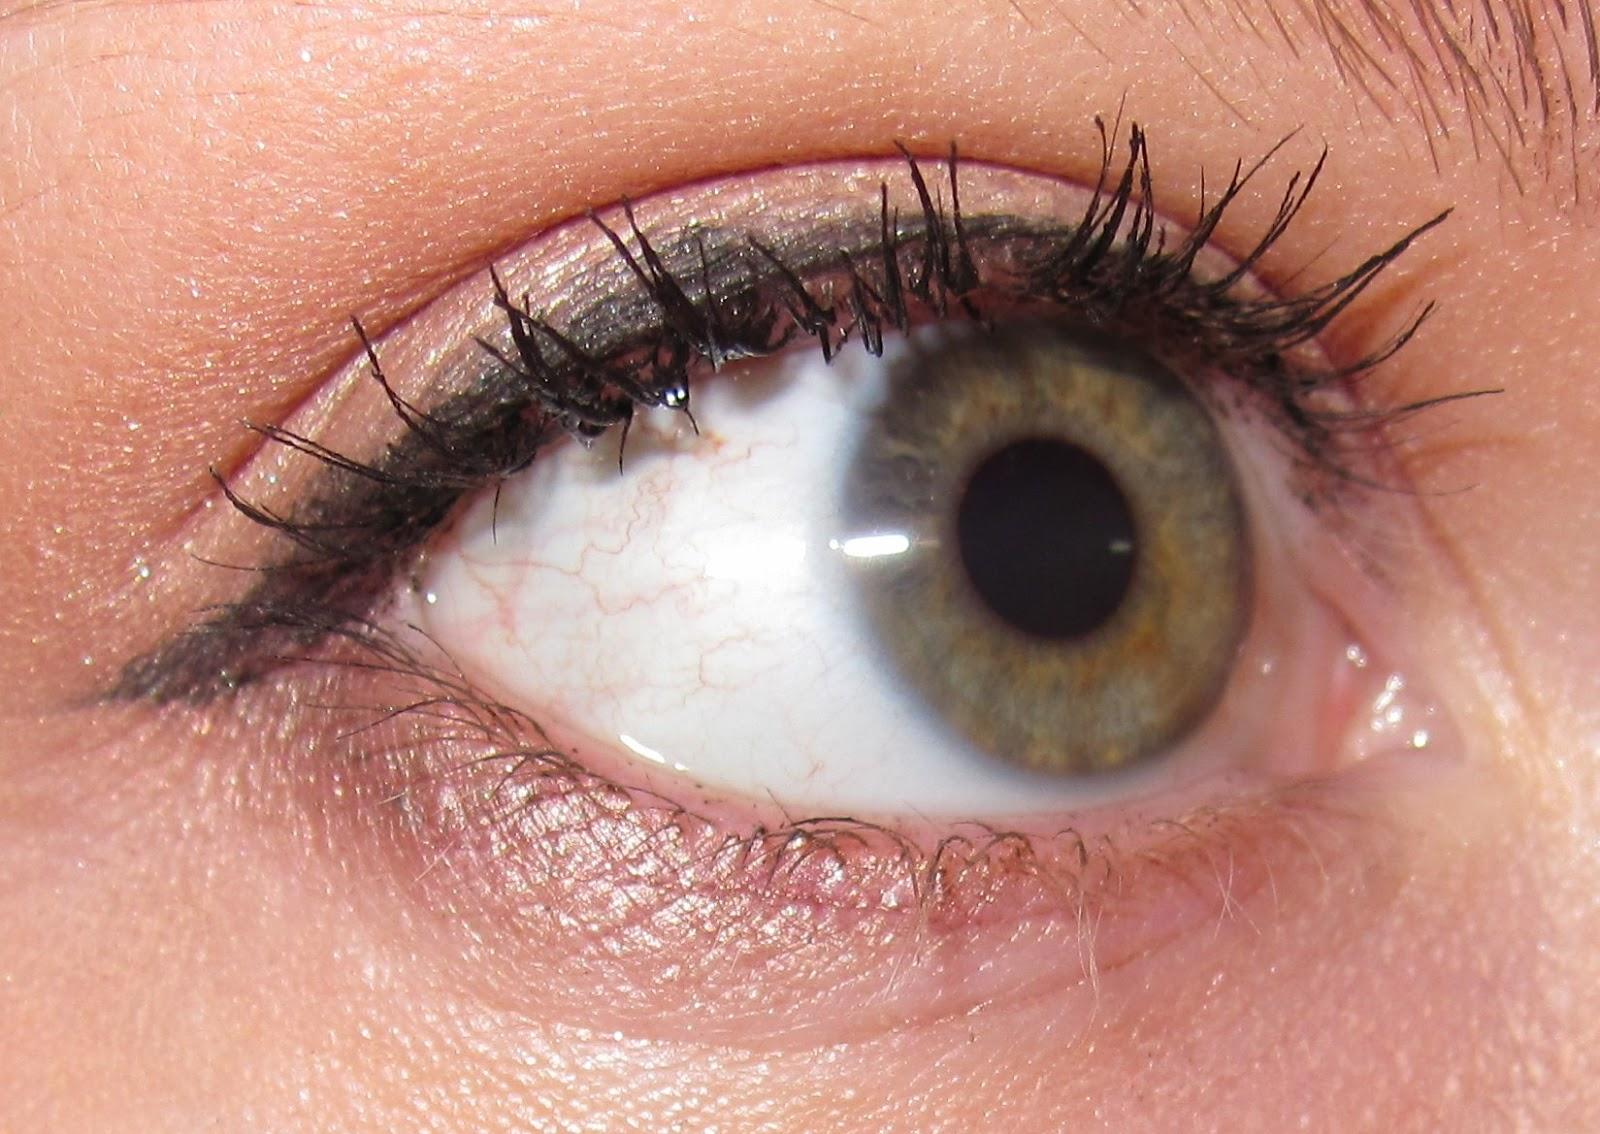 Dazzling Eye Drops USED